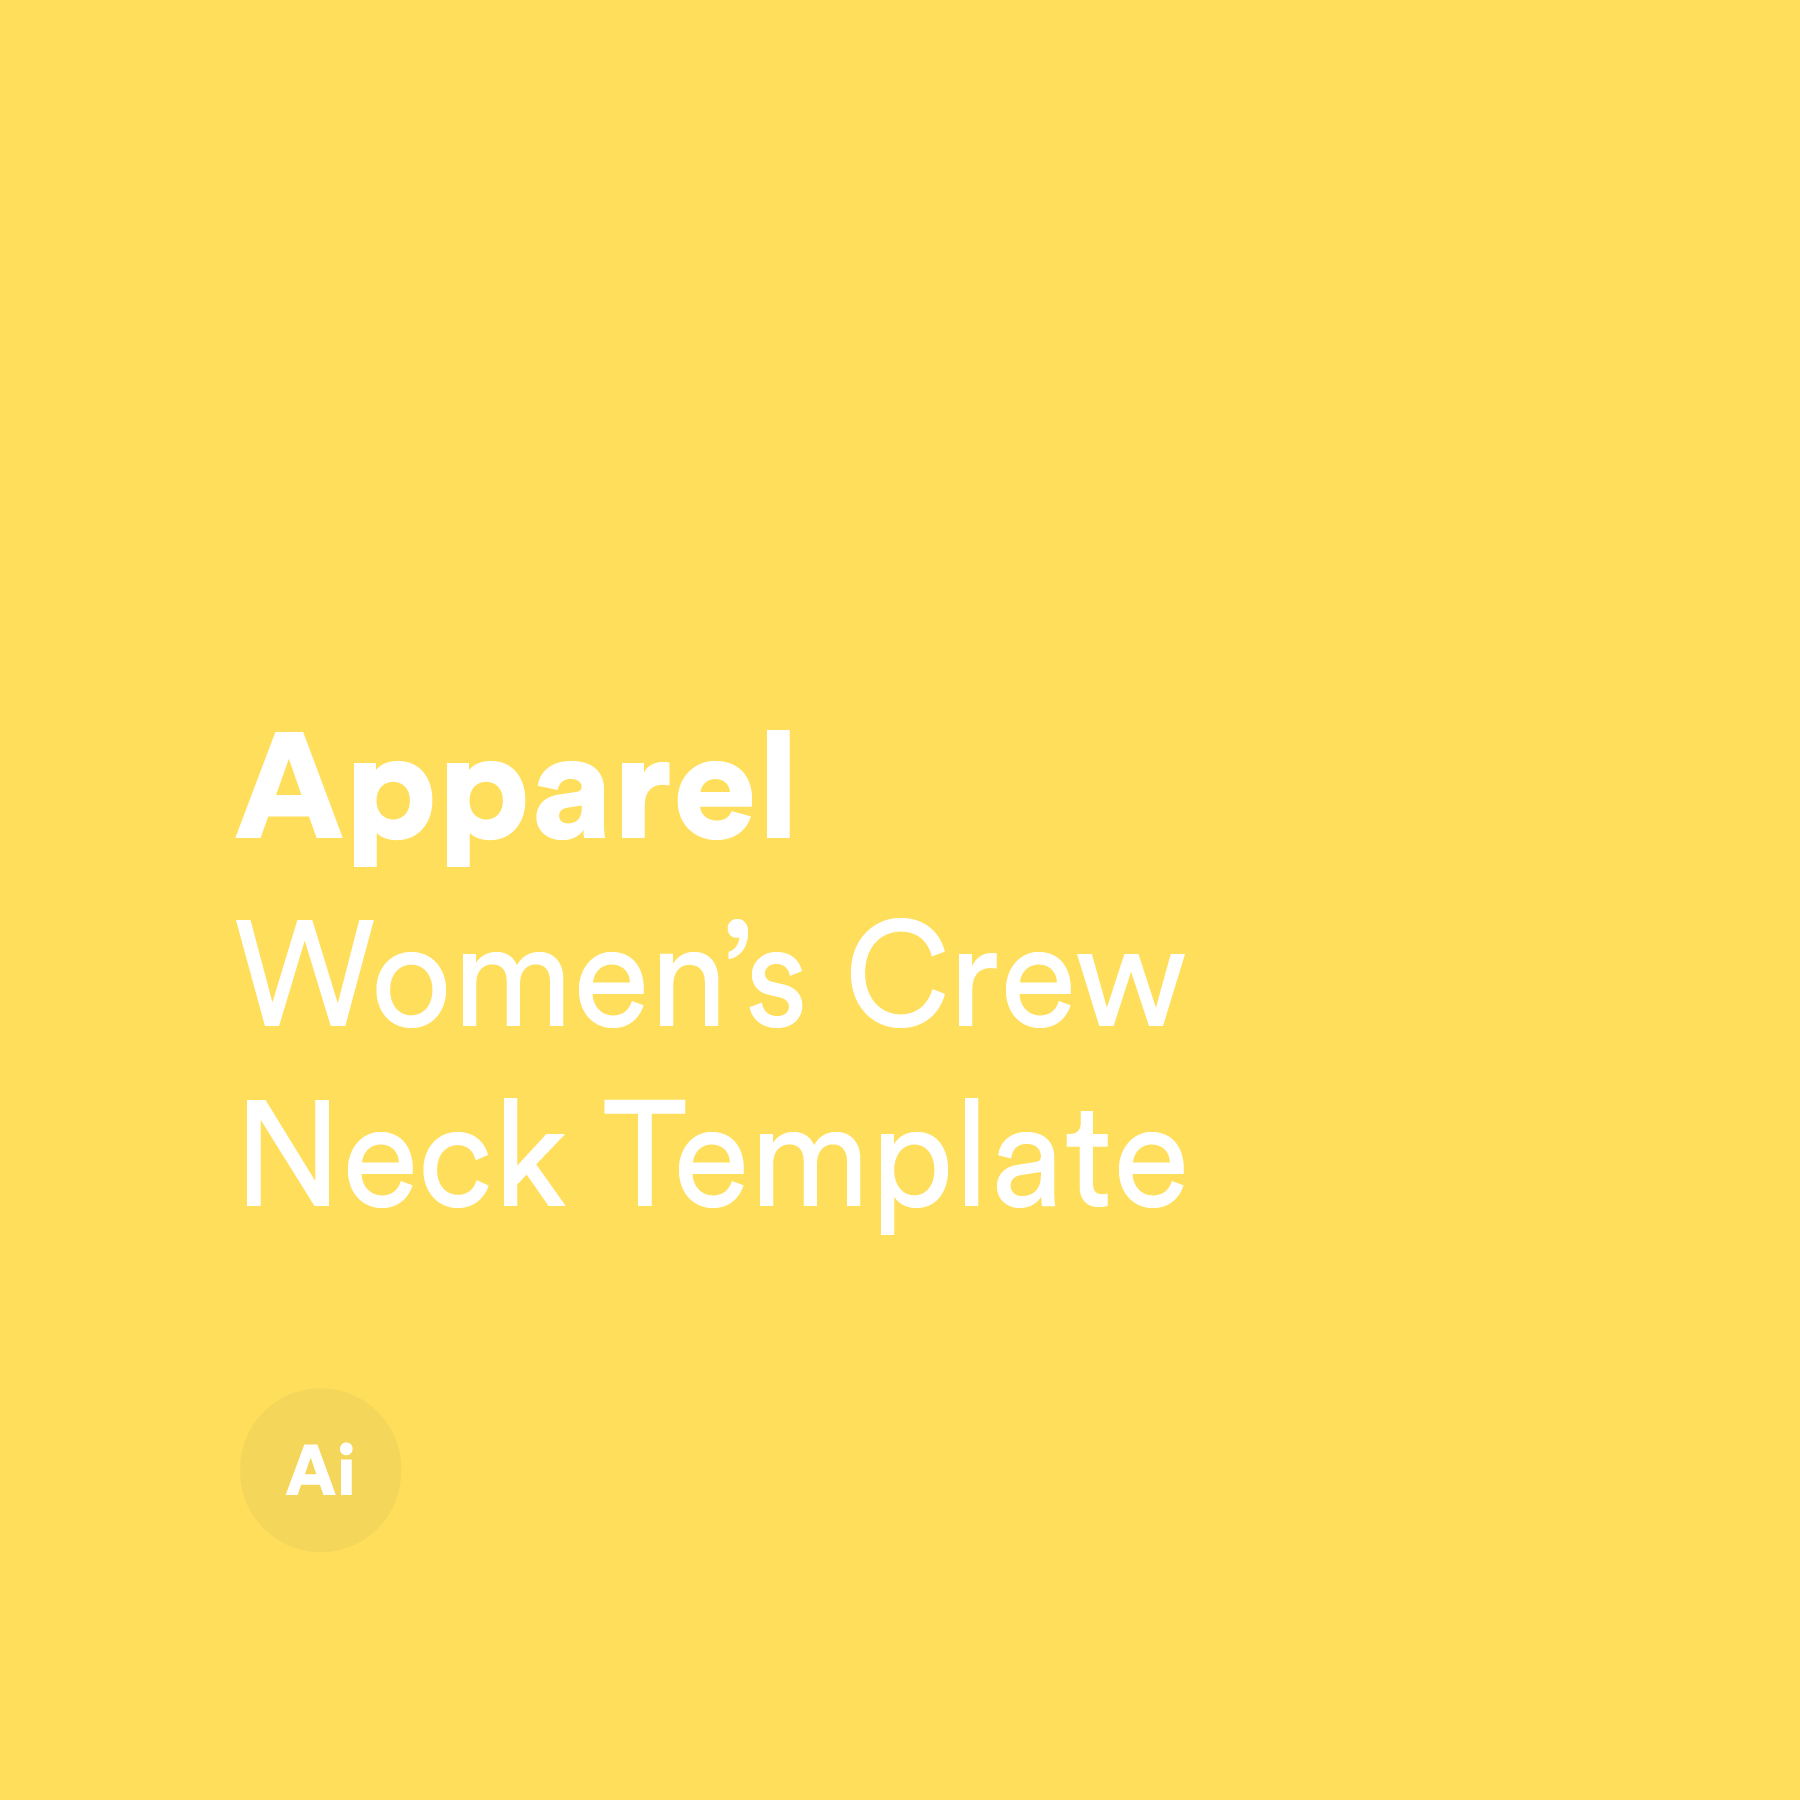 Women's Crew Neck Template